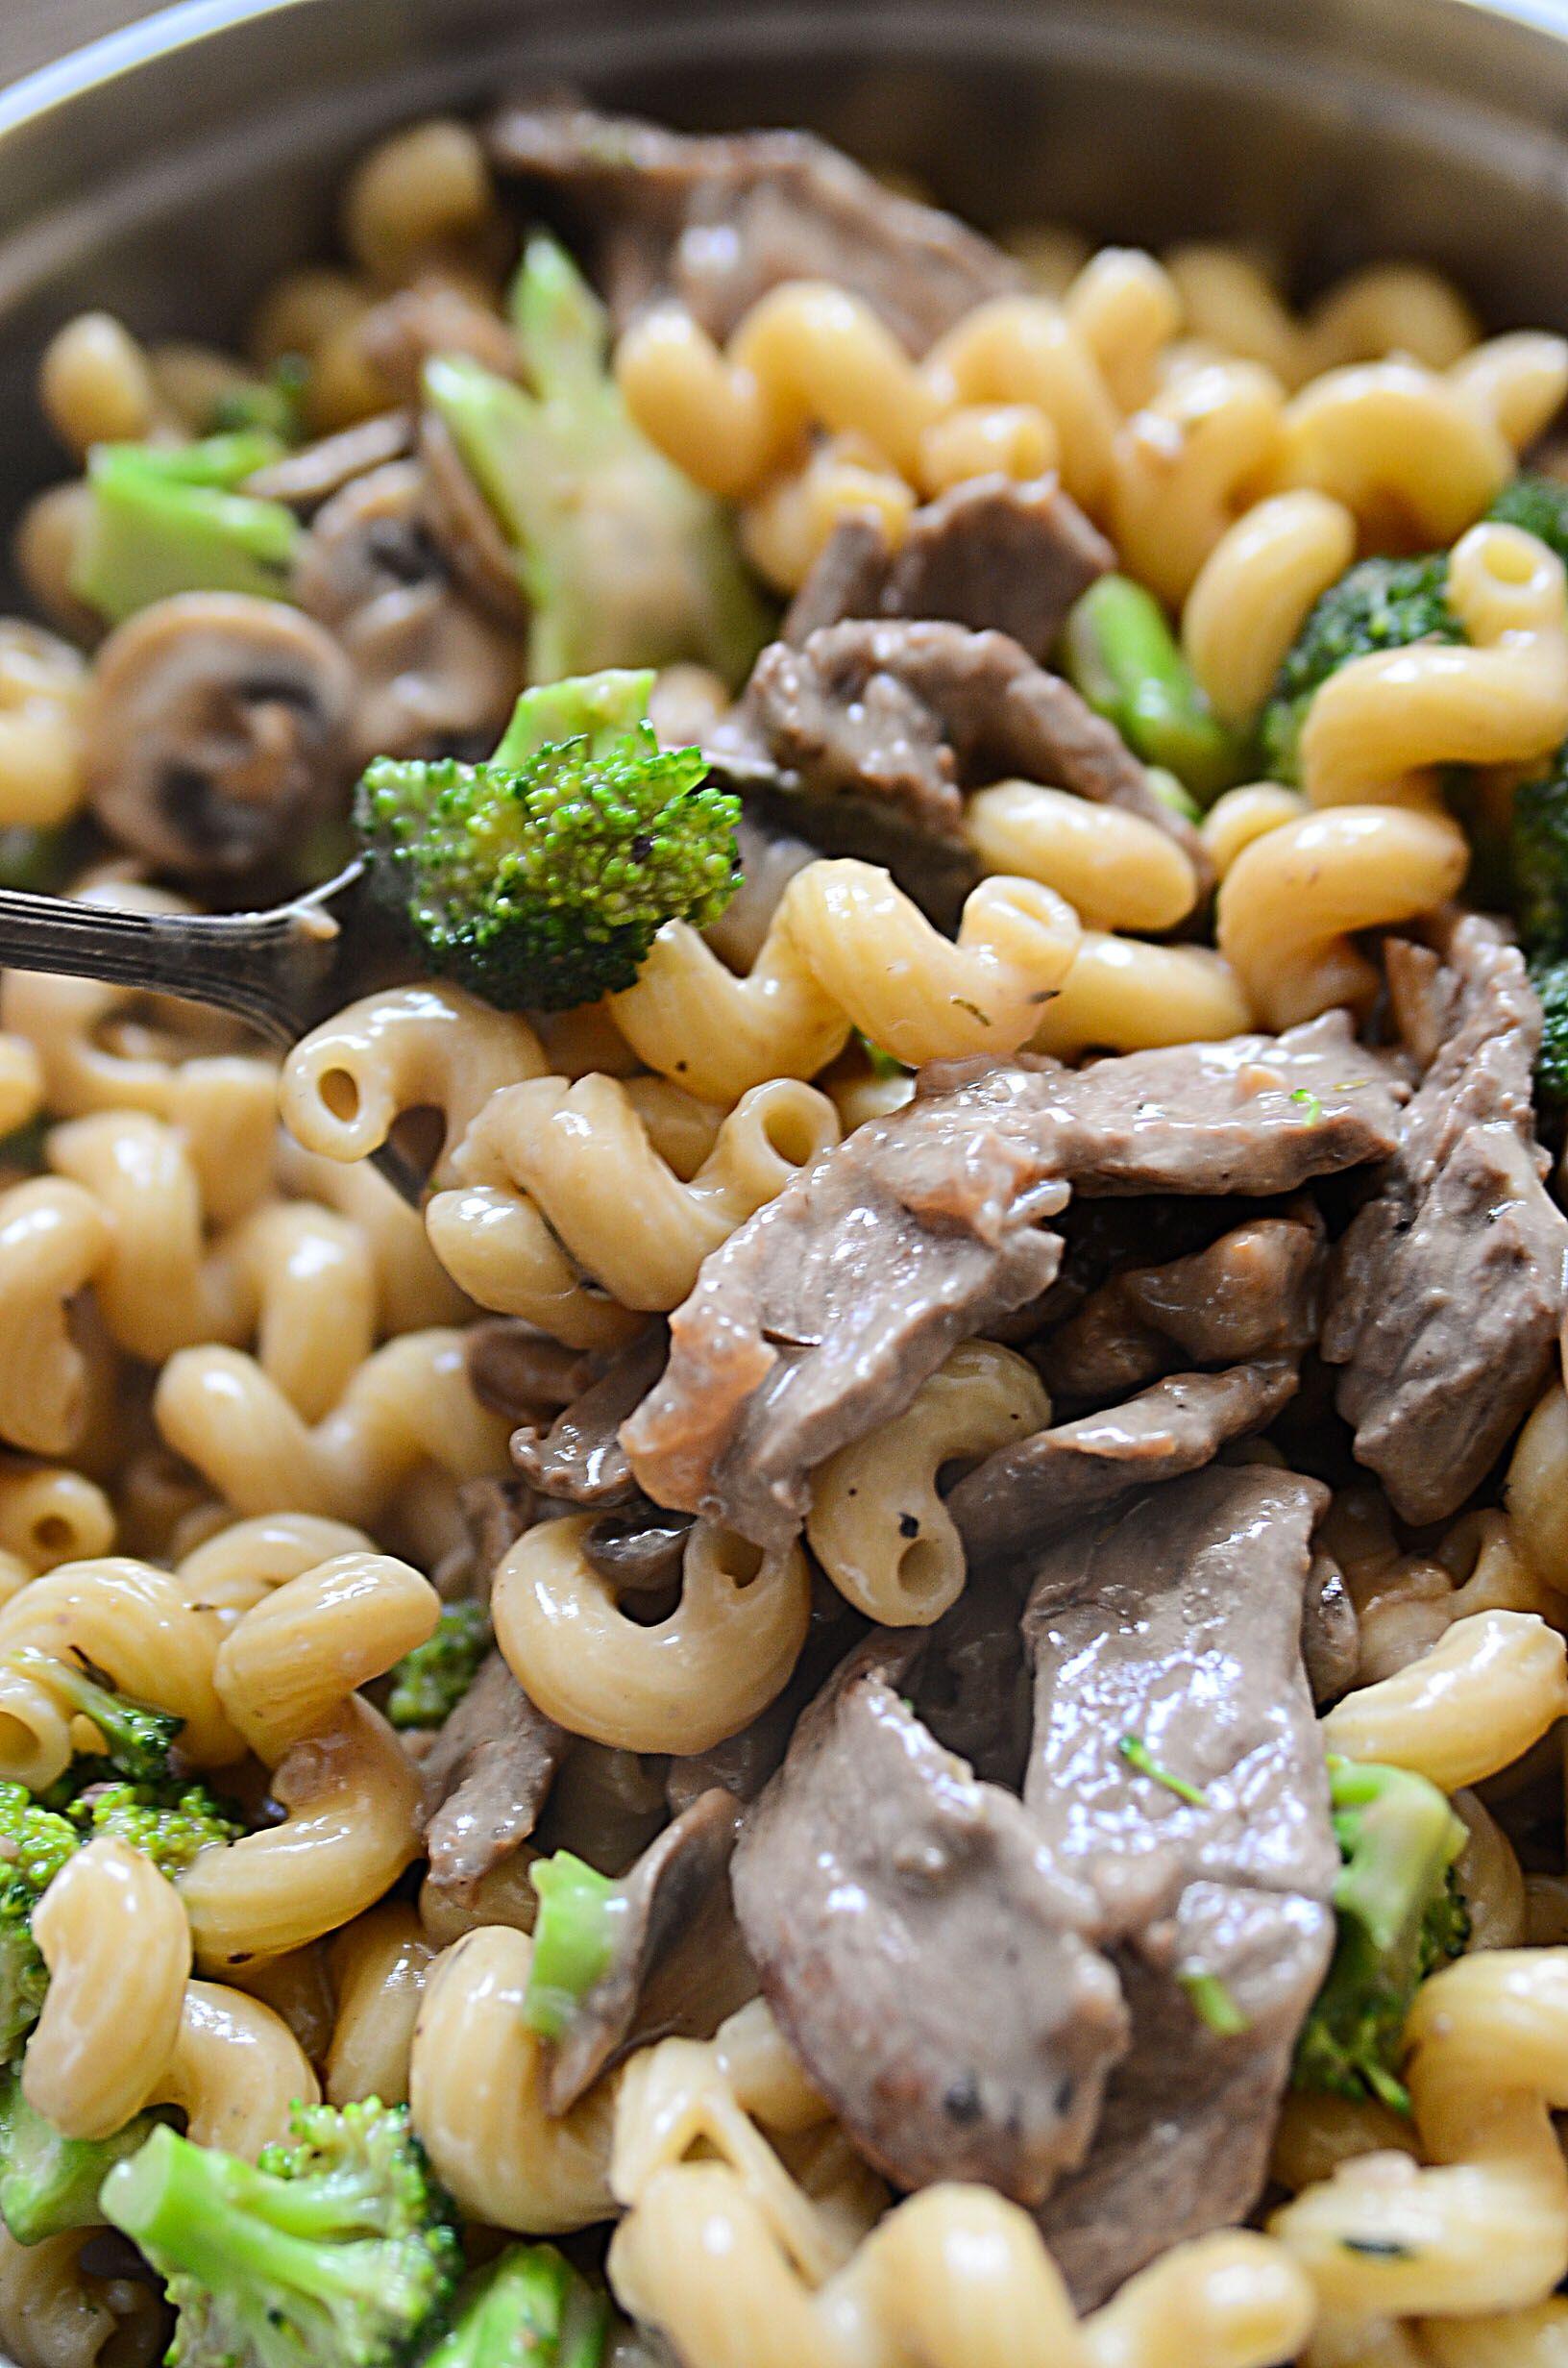 Beef Mushroom And Broccoli Pasta Recipe Steak And Broccoli Pasta Broccoli Pasta